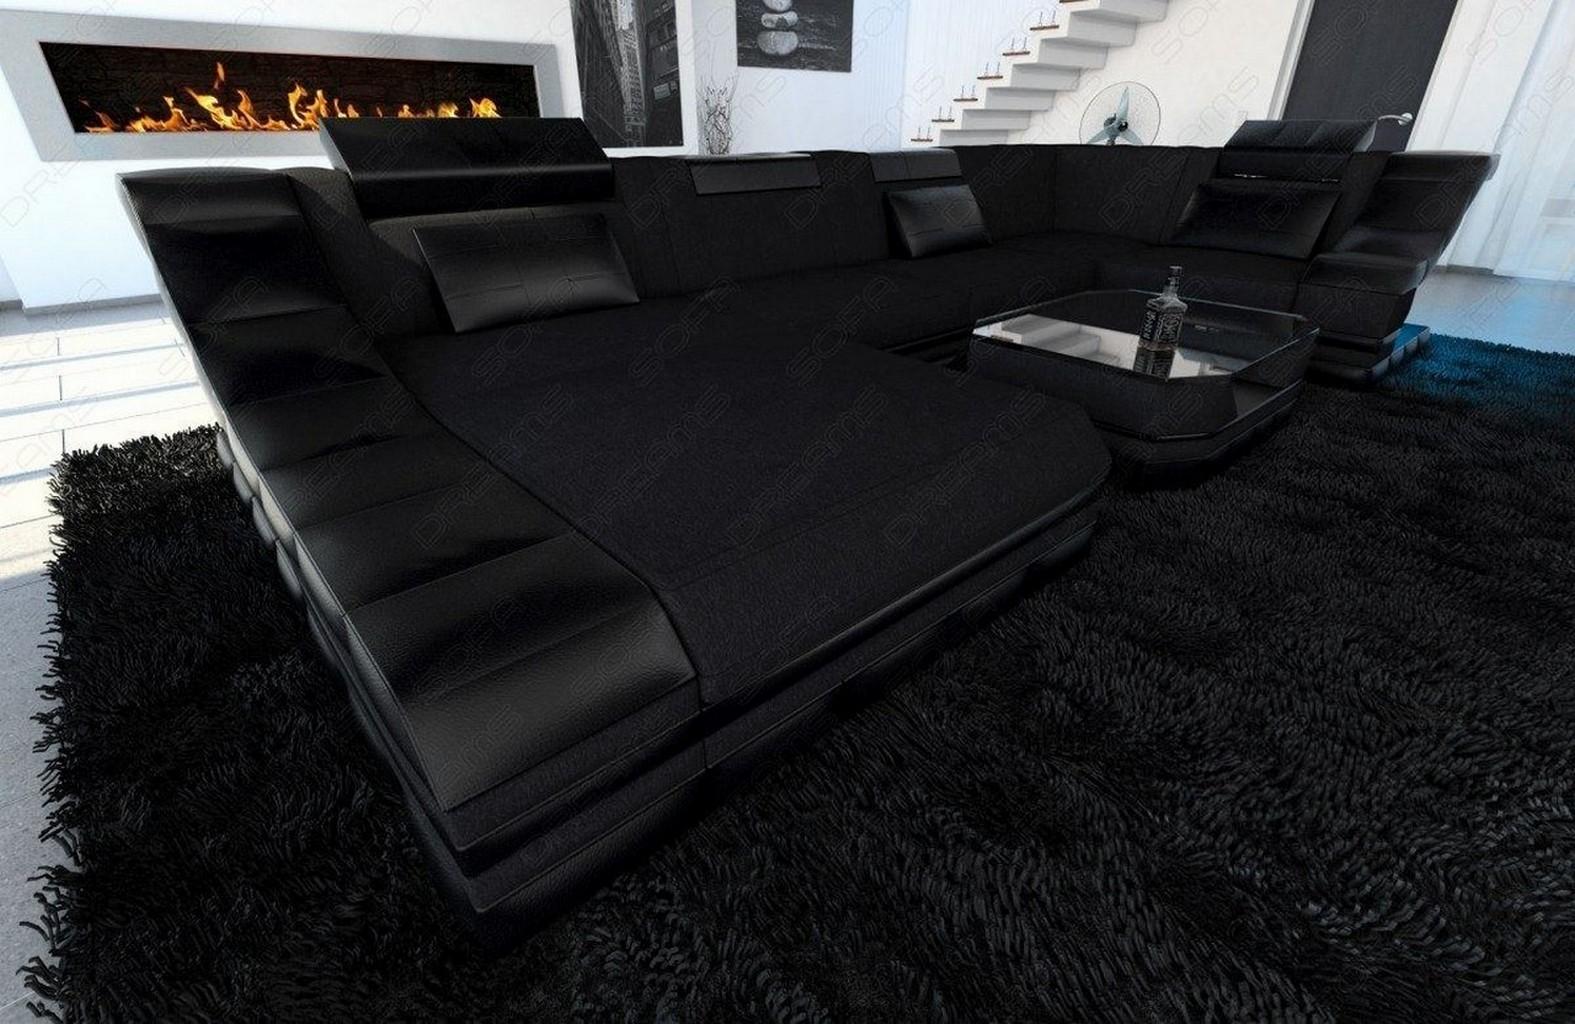 wohnlandschaft in schwarz turino u form mit led beleuchtung stoff sofa ecksofa ebay. Black Bedroom Furniture Sets. Home Design Ideas